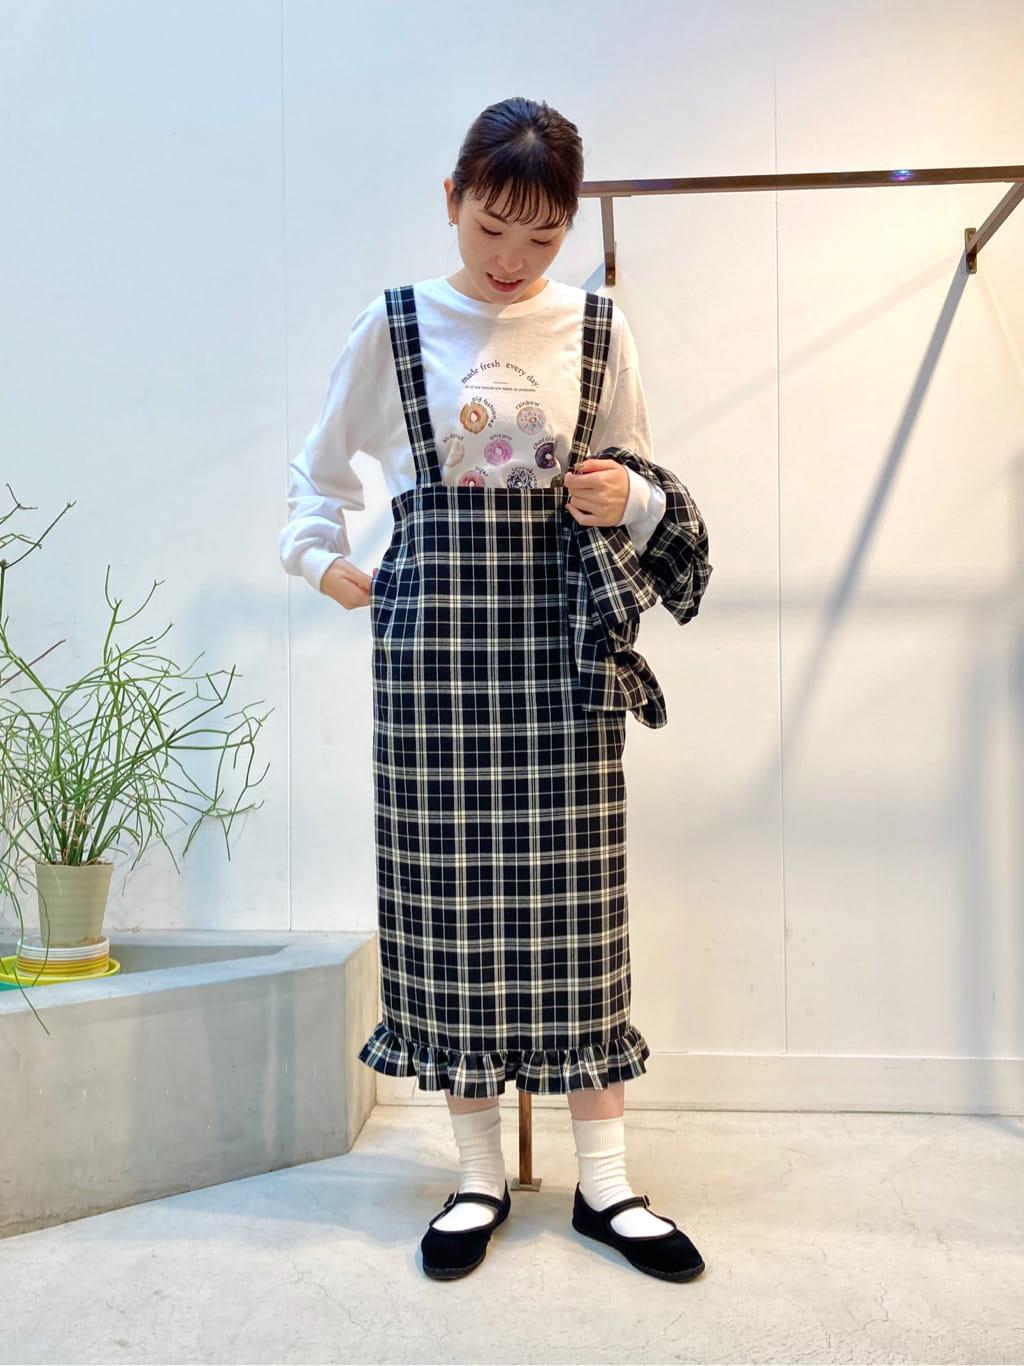 l'atelier du savon 名古屋栄路面 身長:161cm 2021.09.13